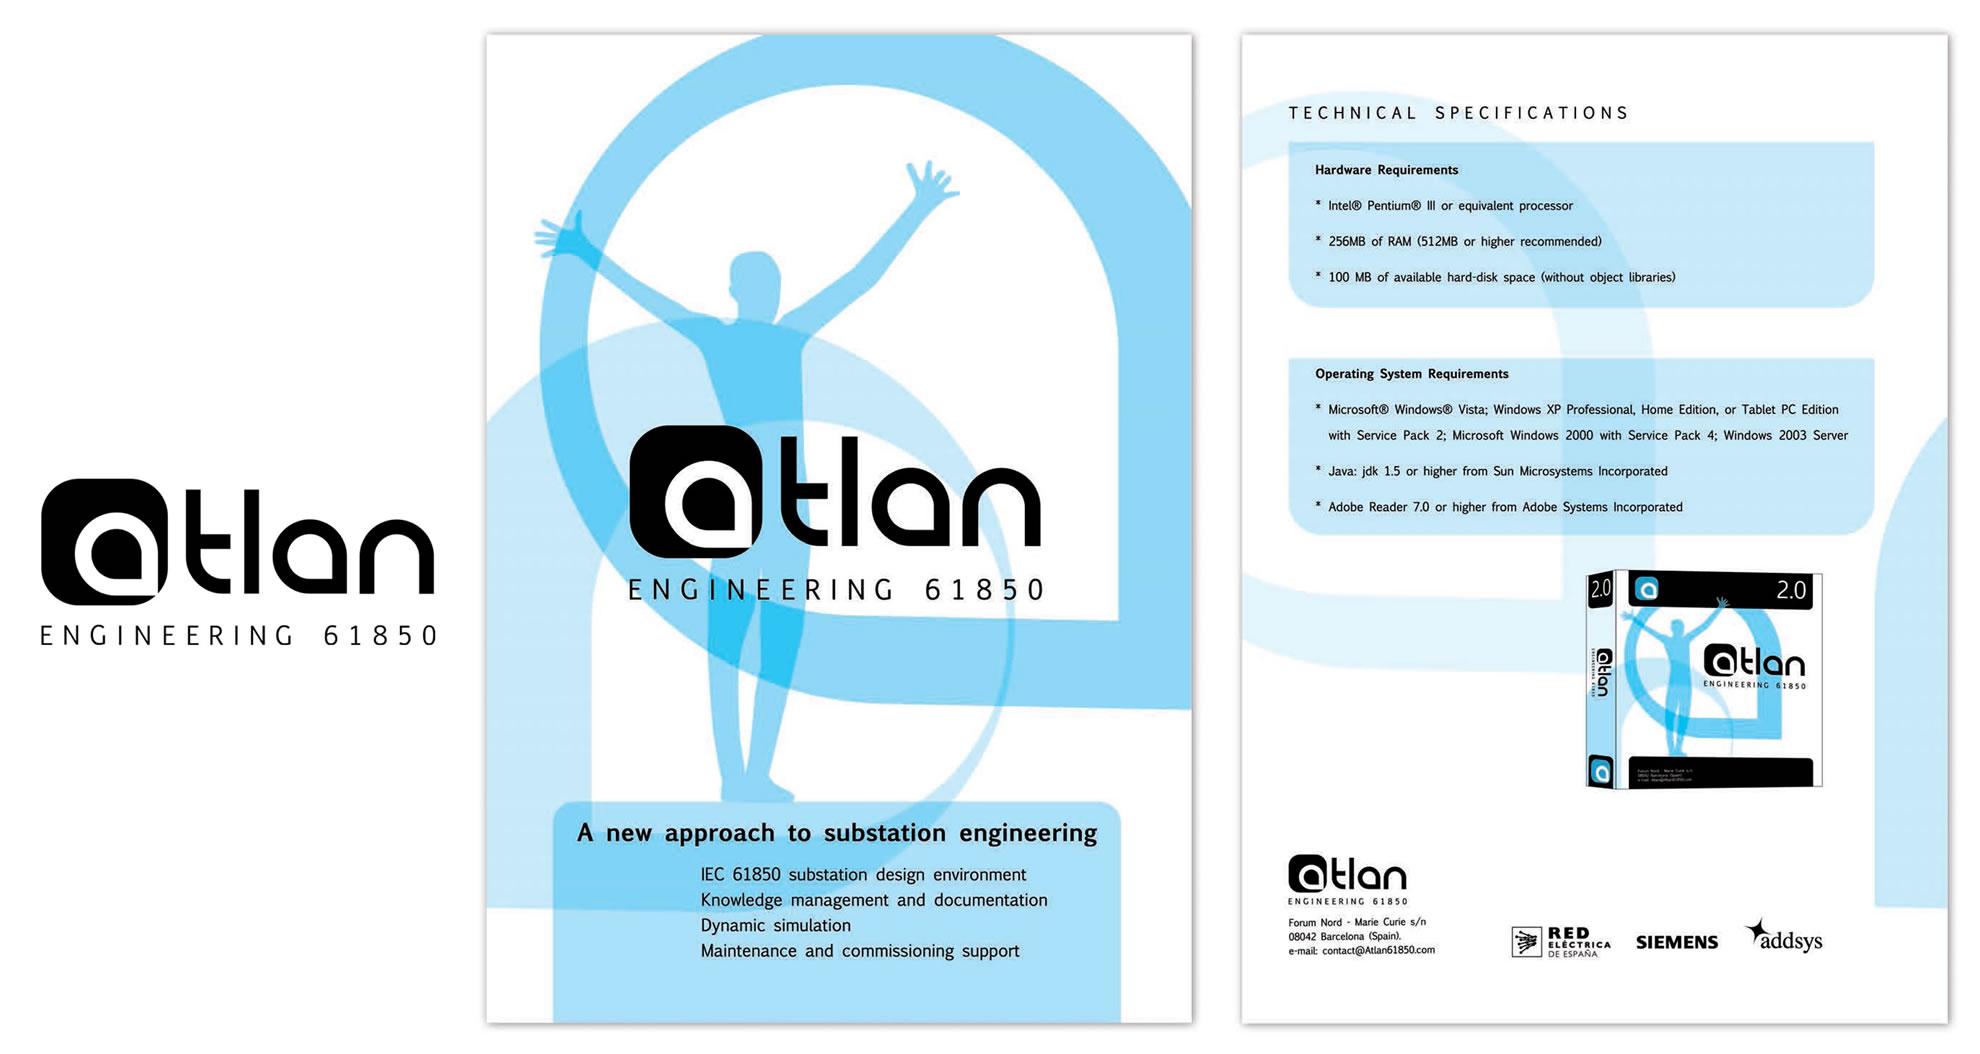 atlan-imagen-corporativa